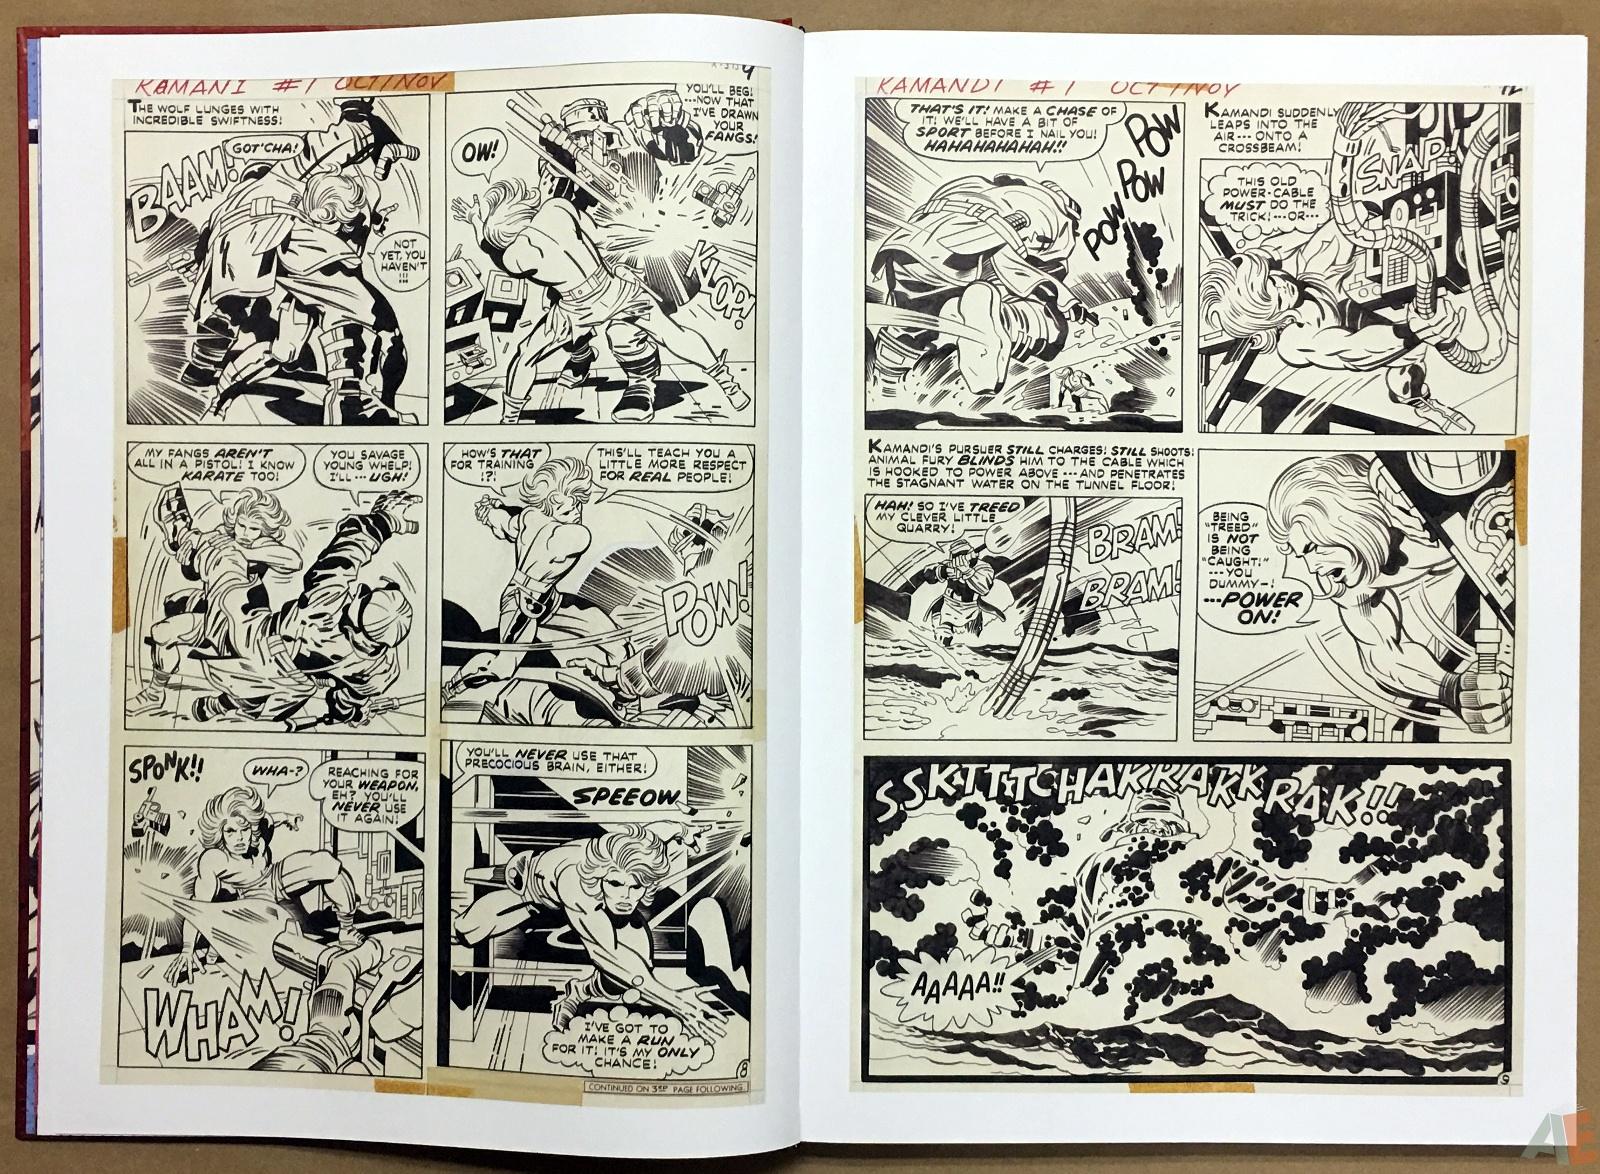 Jack Kirby Kamandi The Last Boy On Earth Artist's Edition 10